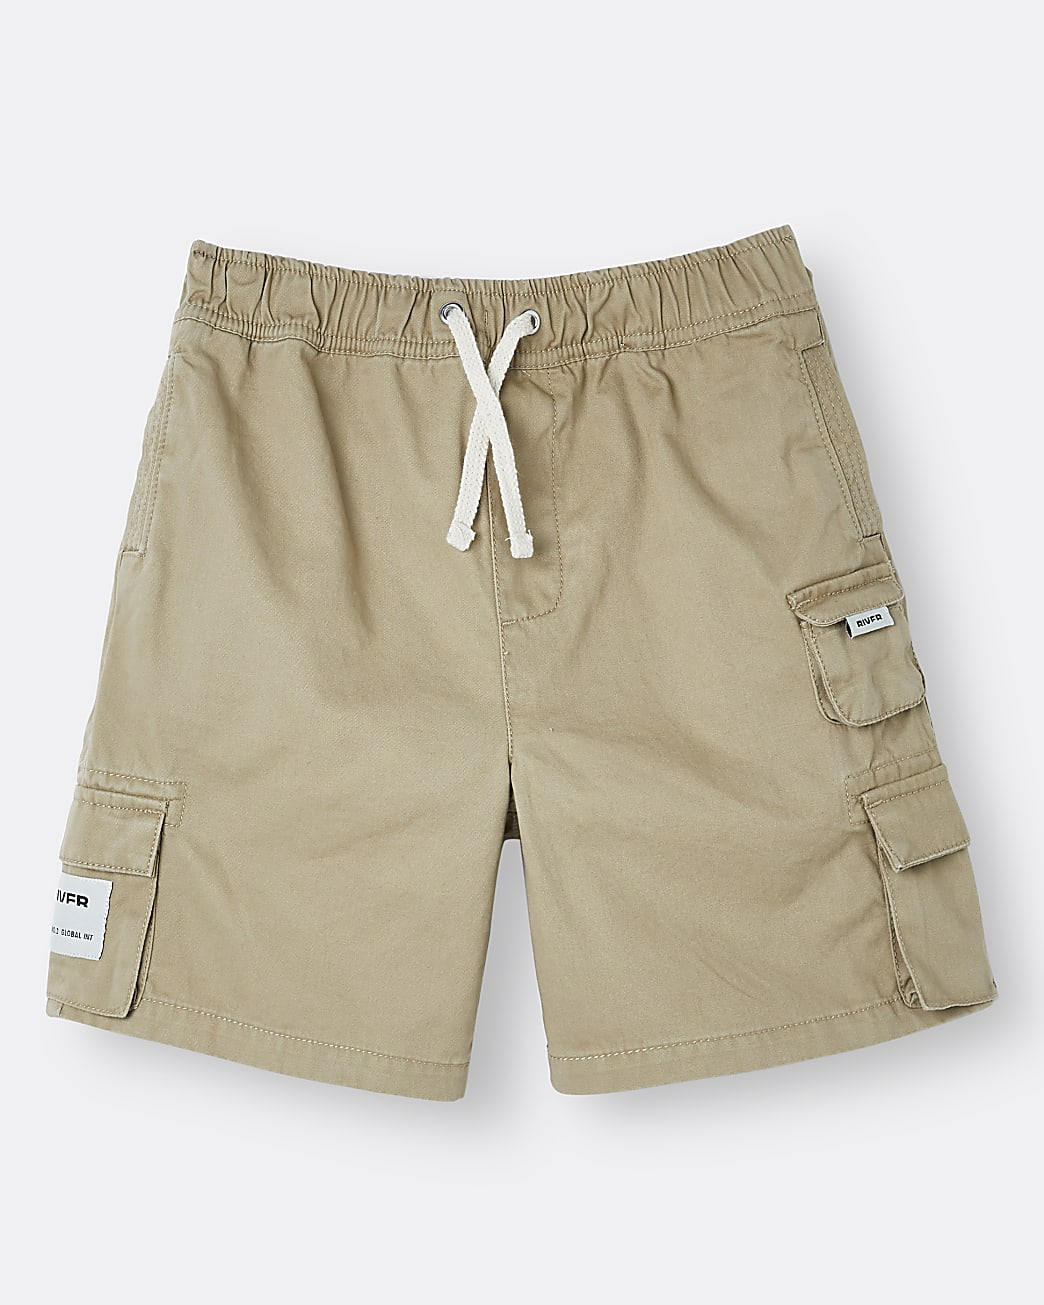 Boys stone River cargo shorts